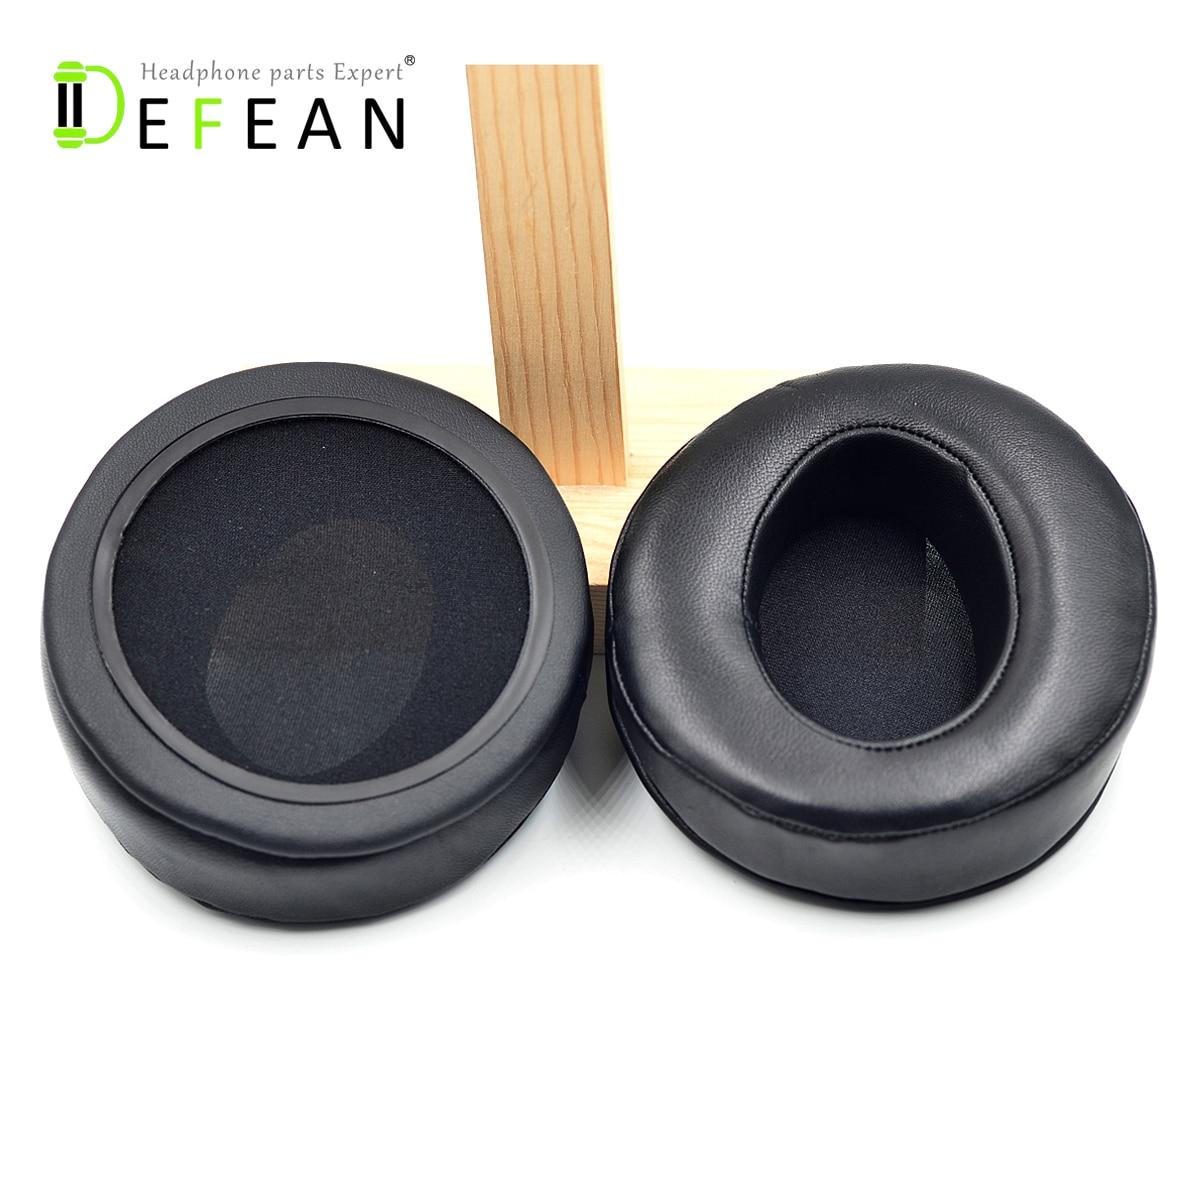 Defean Angle Genuine Leather Ear Pads Cushion for AKG K Series K550 K551 k553 Headset Headphones